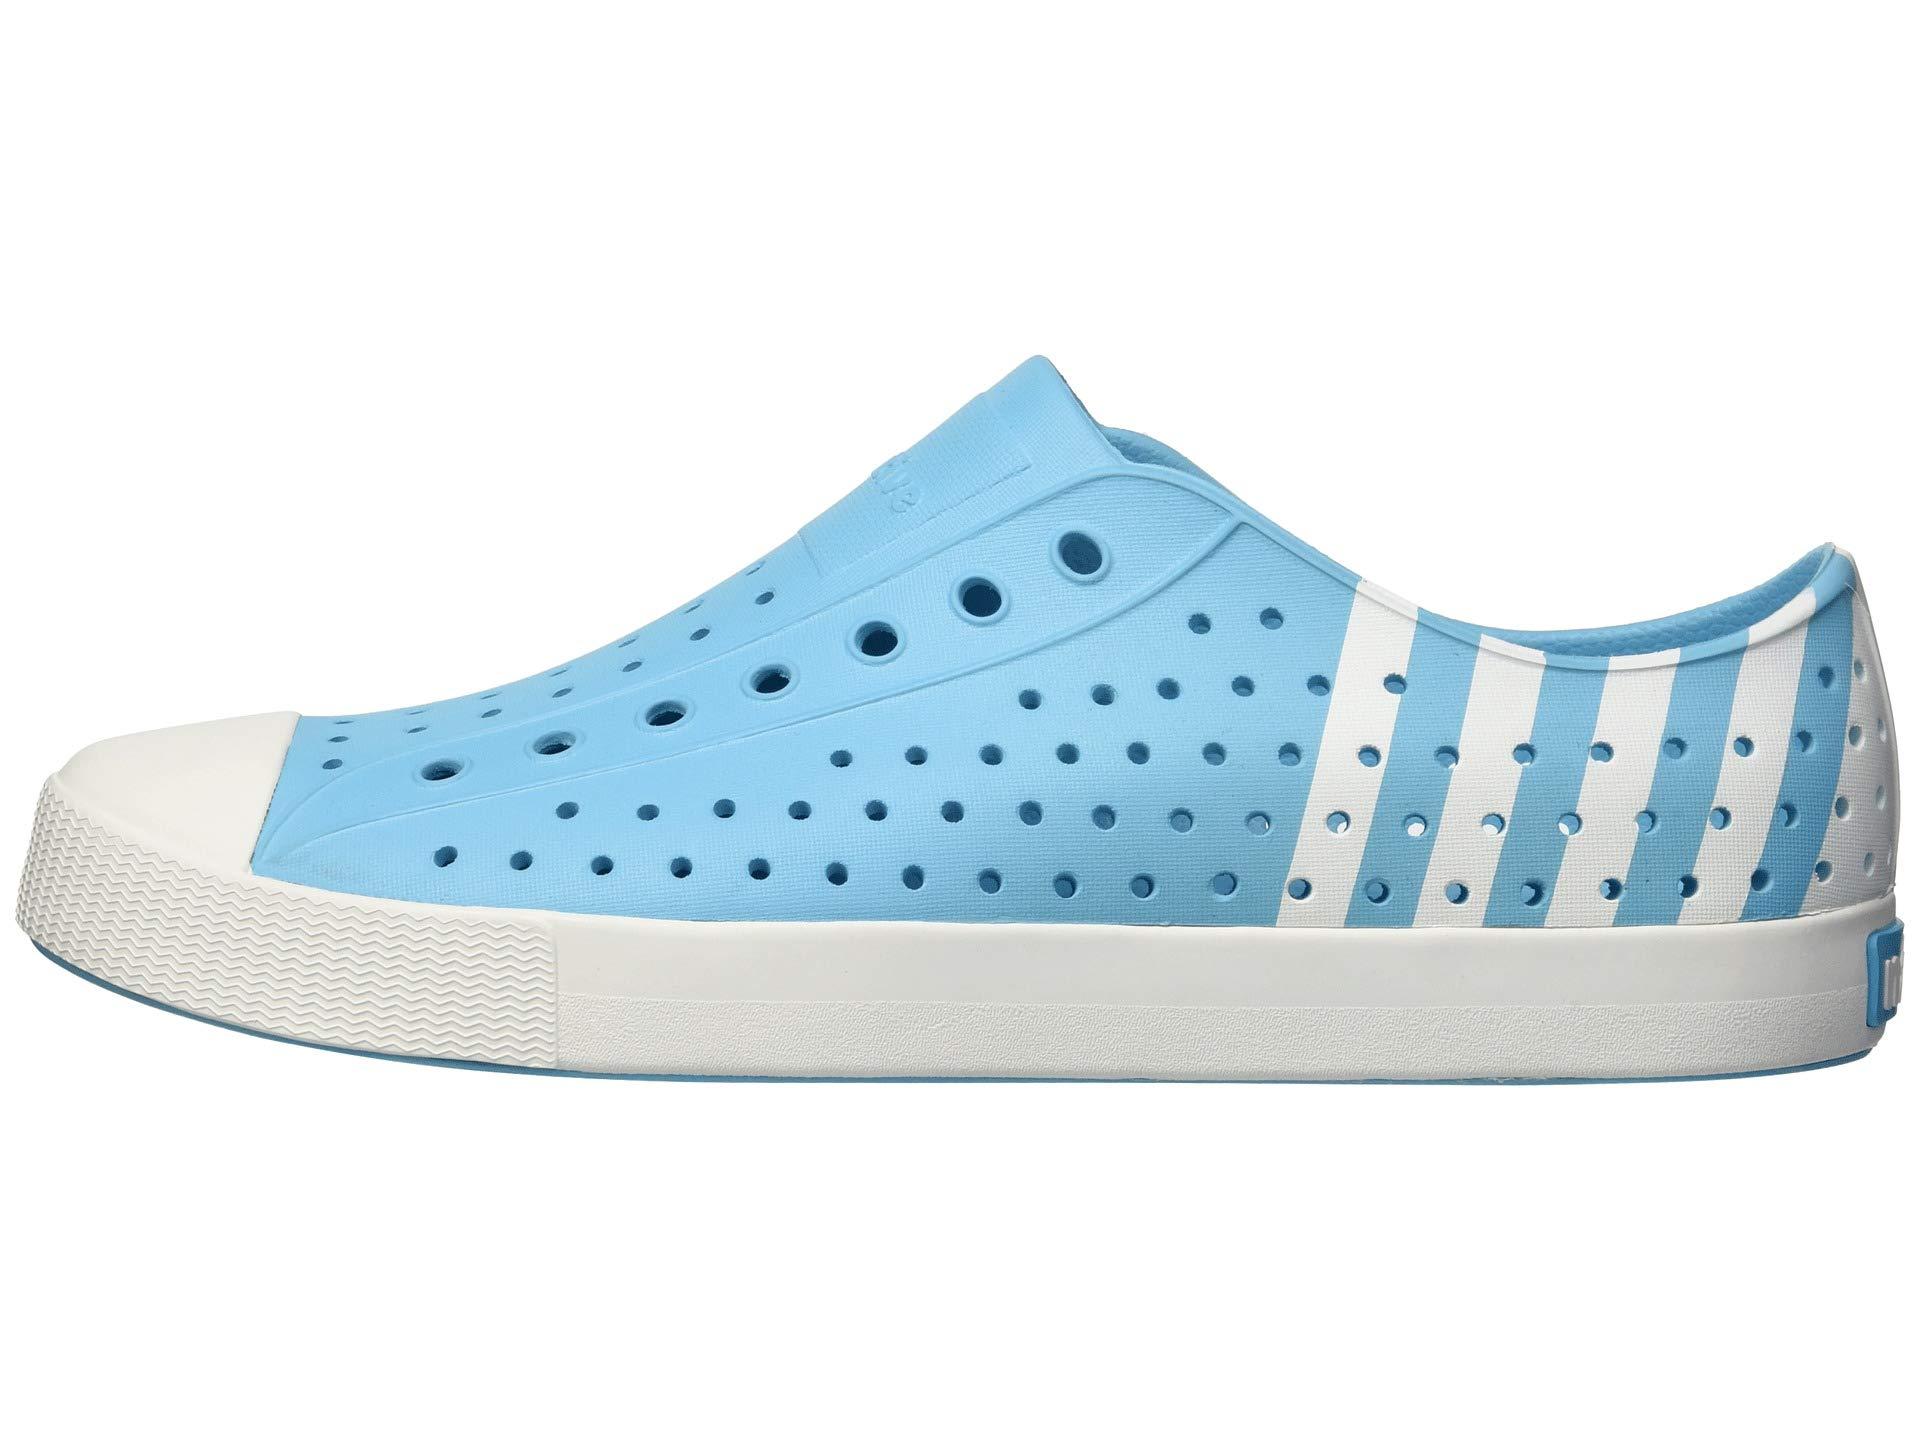 shell shell Jefferson Shoes Stripe Surfer Blue Native White qTfxwq8